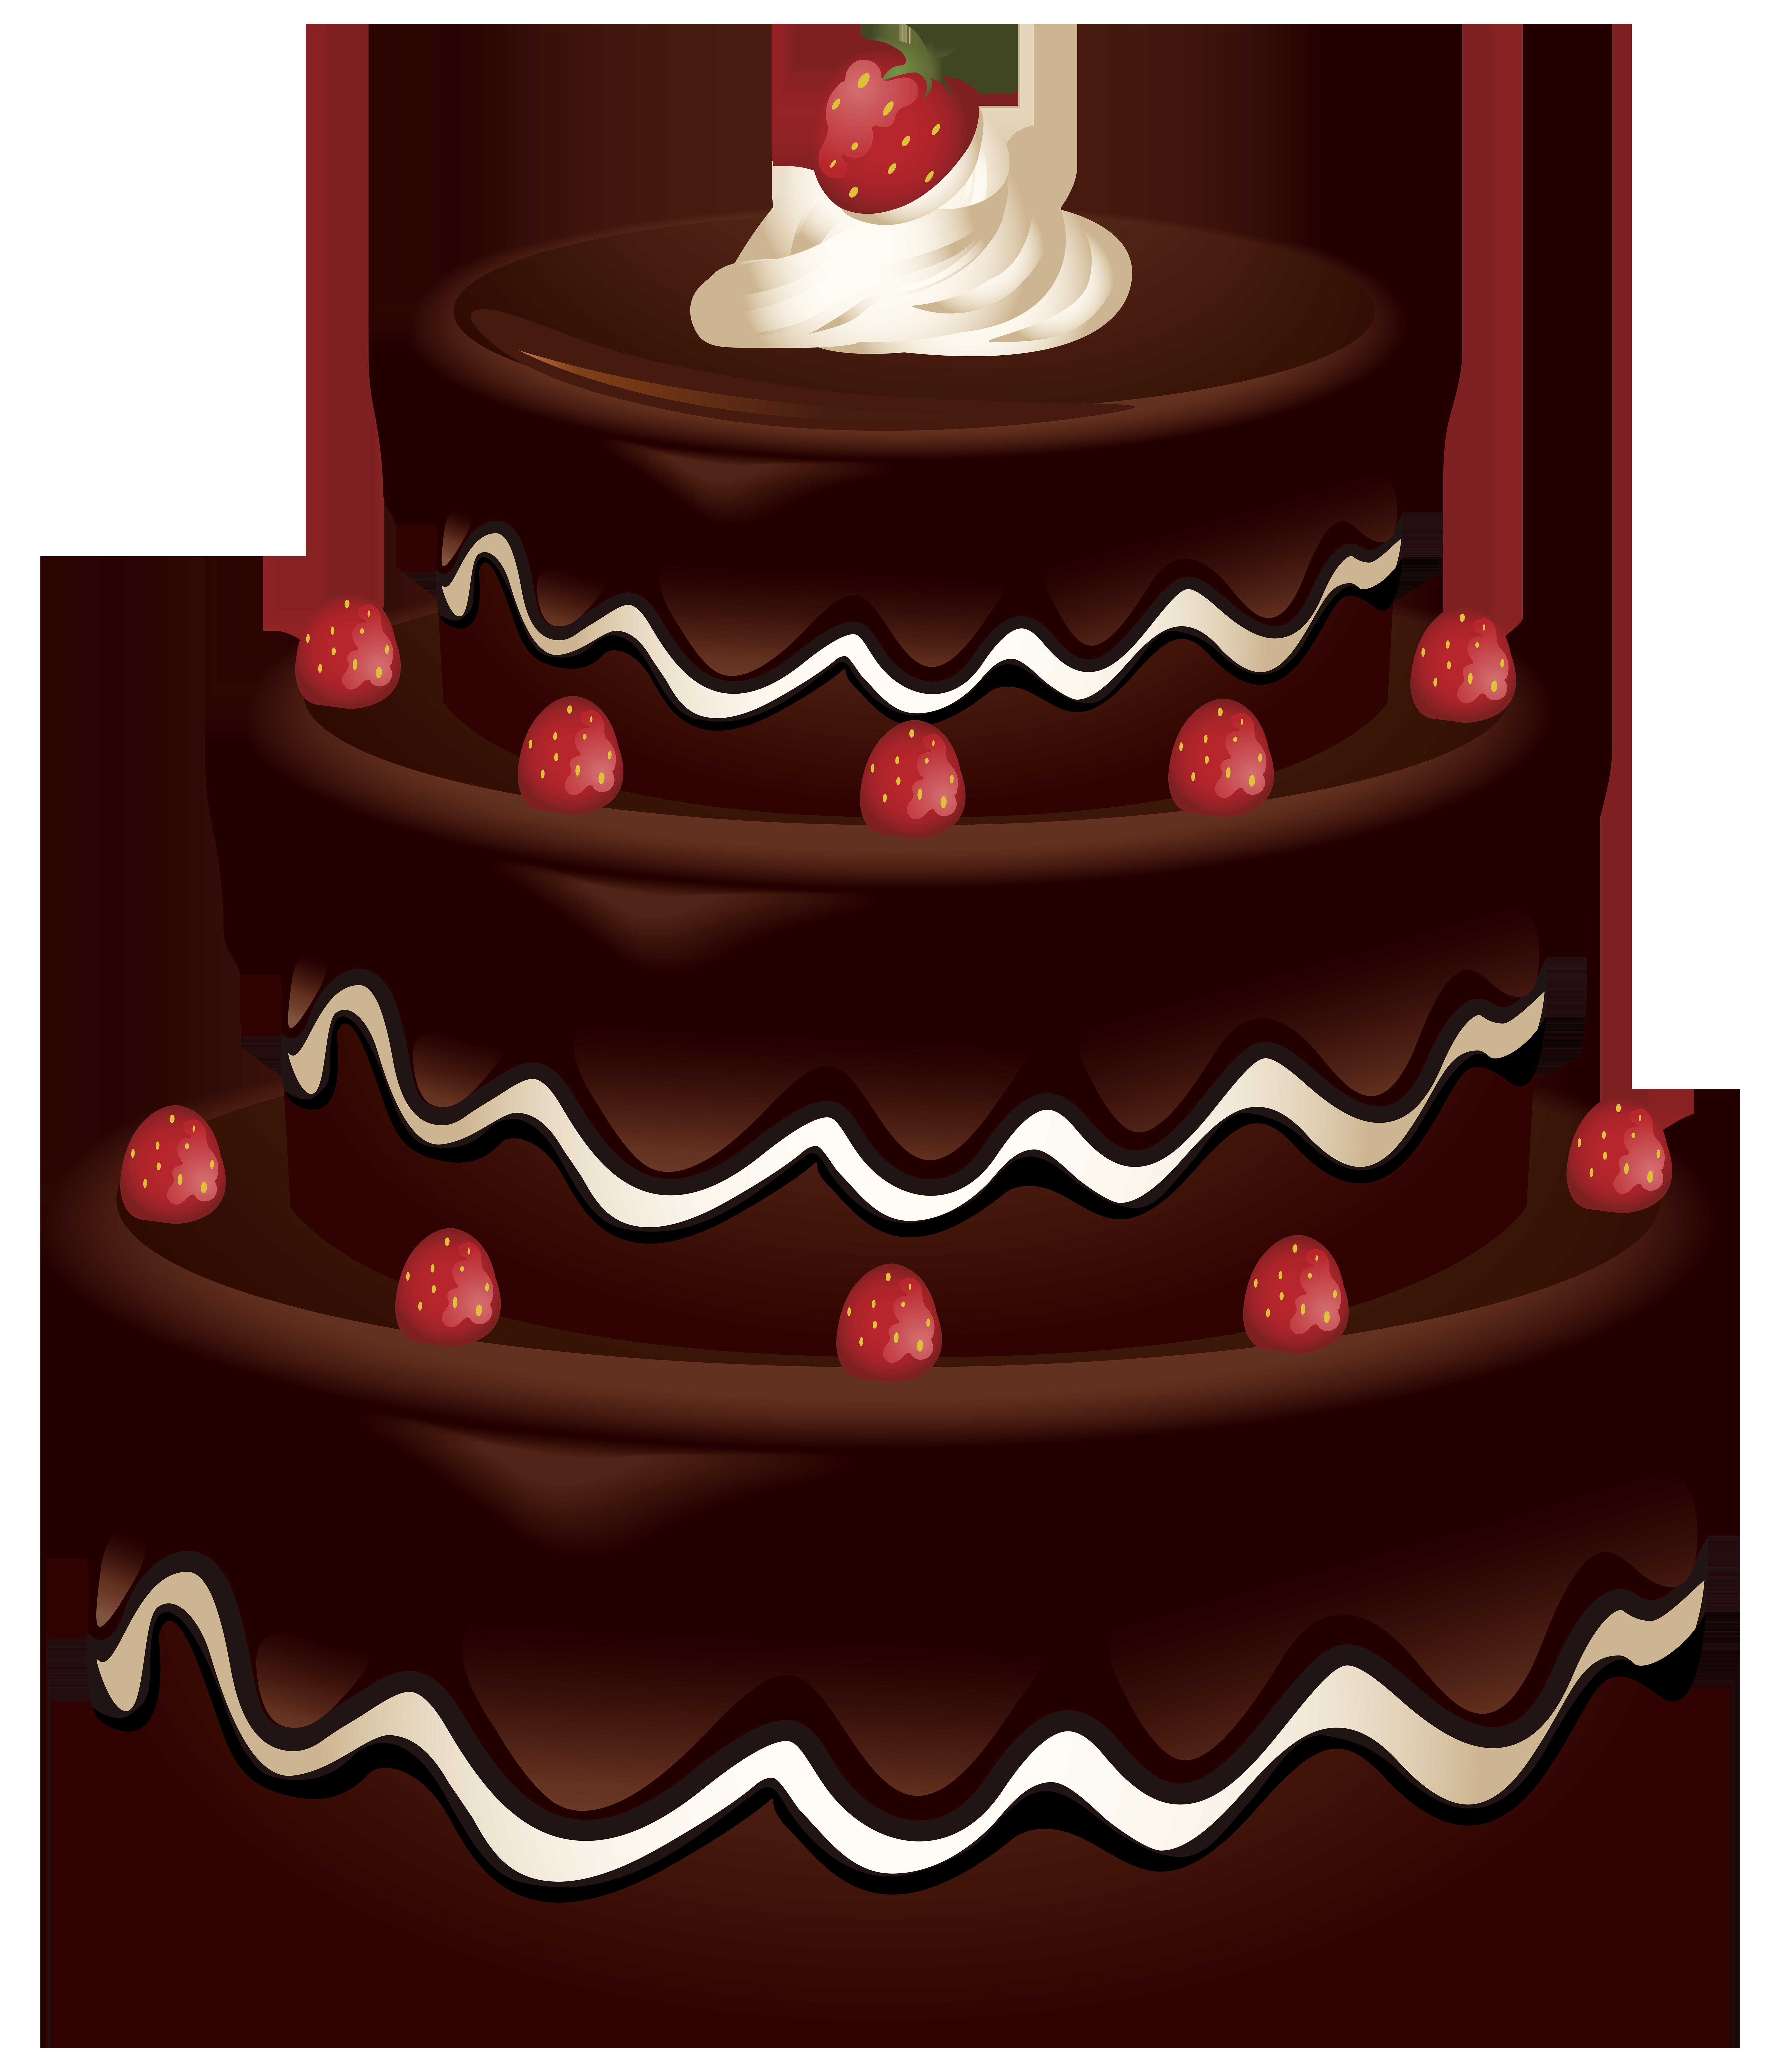 Cake Clip Art PNG Image.